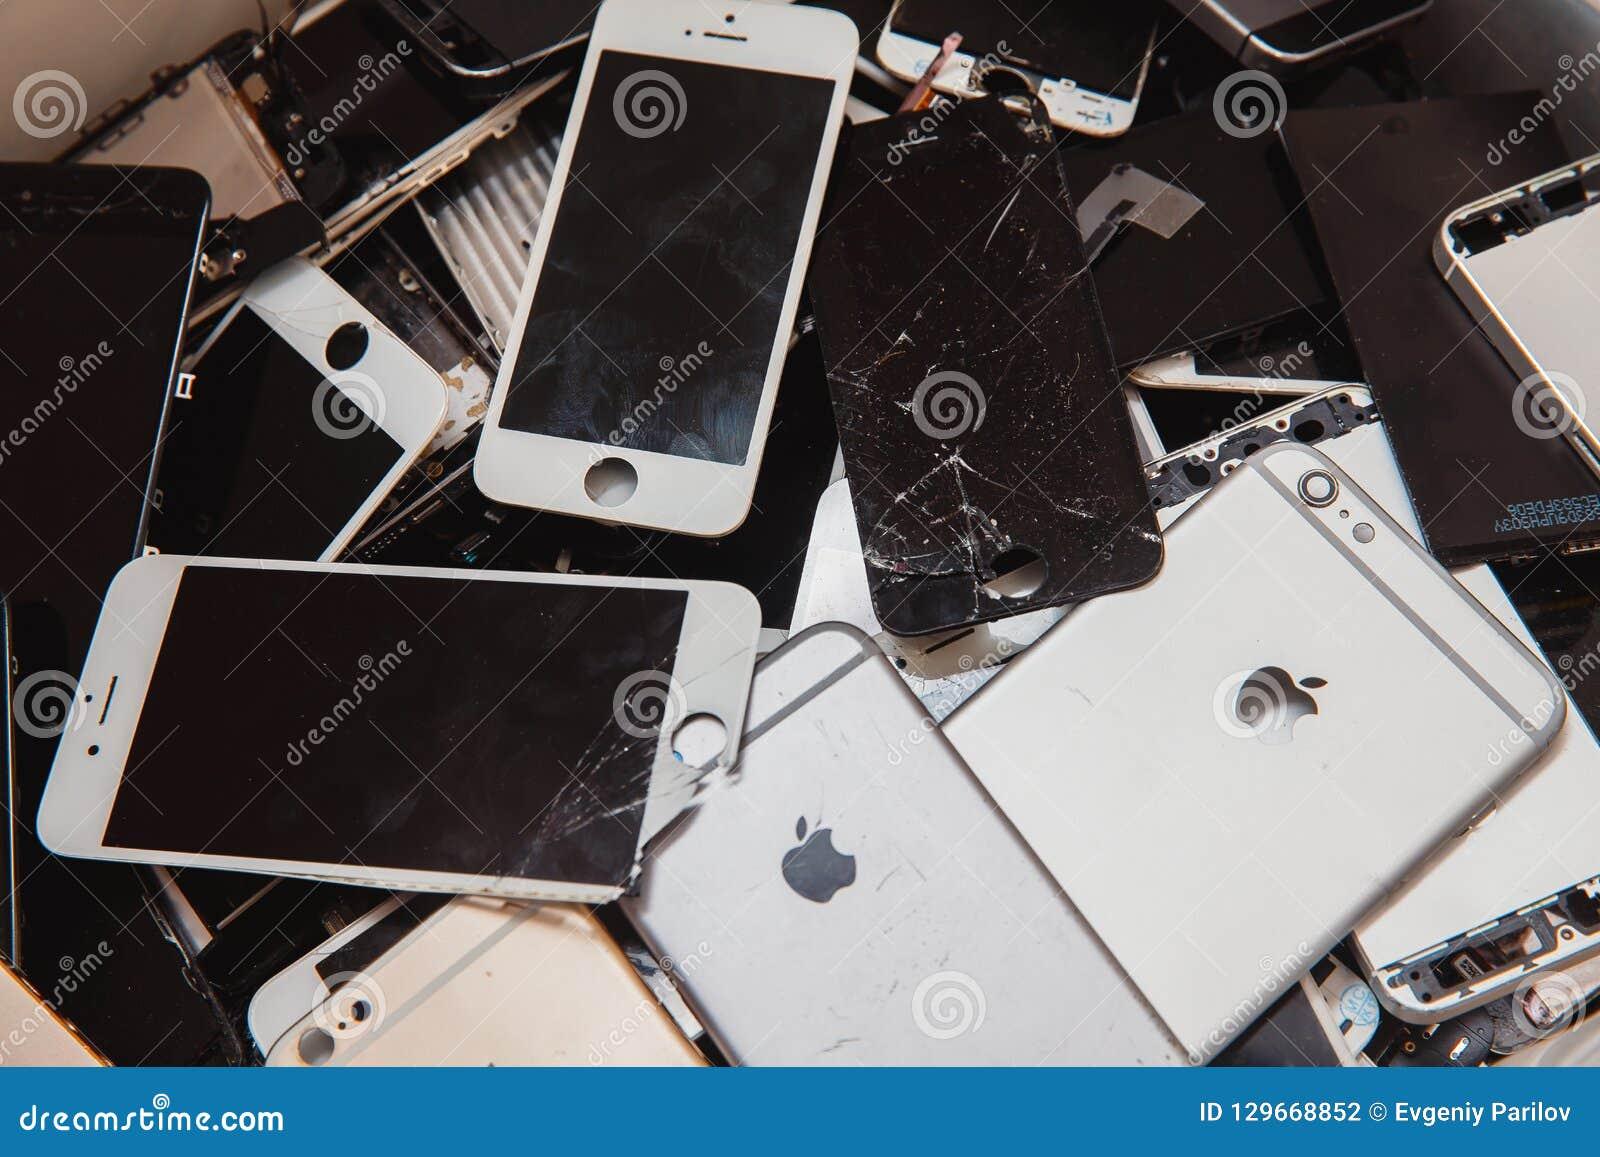 Broken panels and screens of iPhone